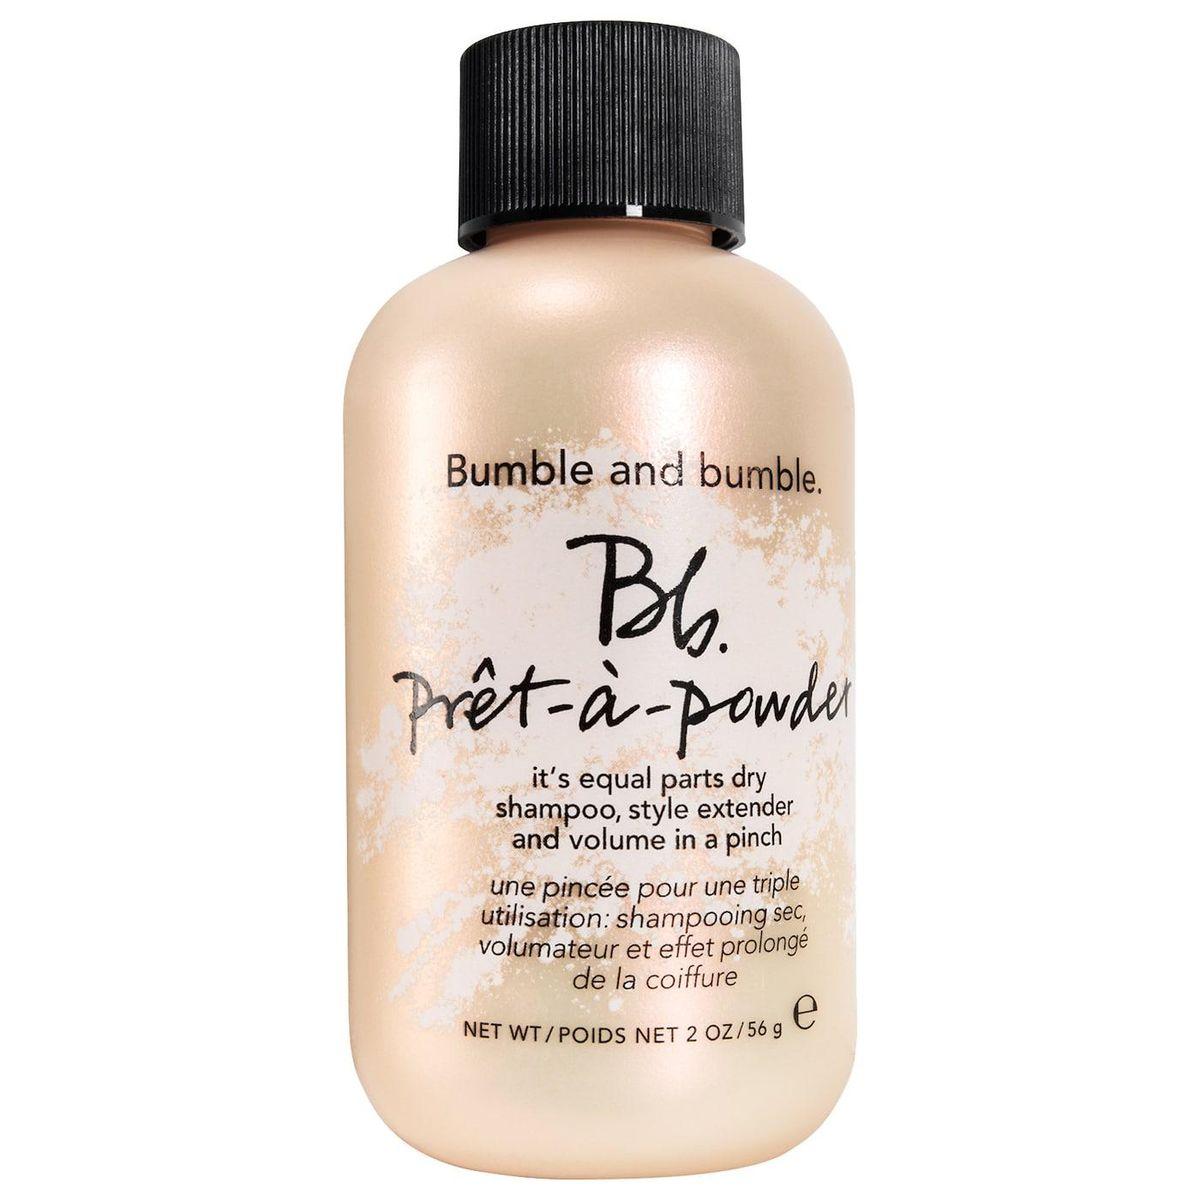 bumble and bumble pret a powder dry shampoo powder